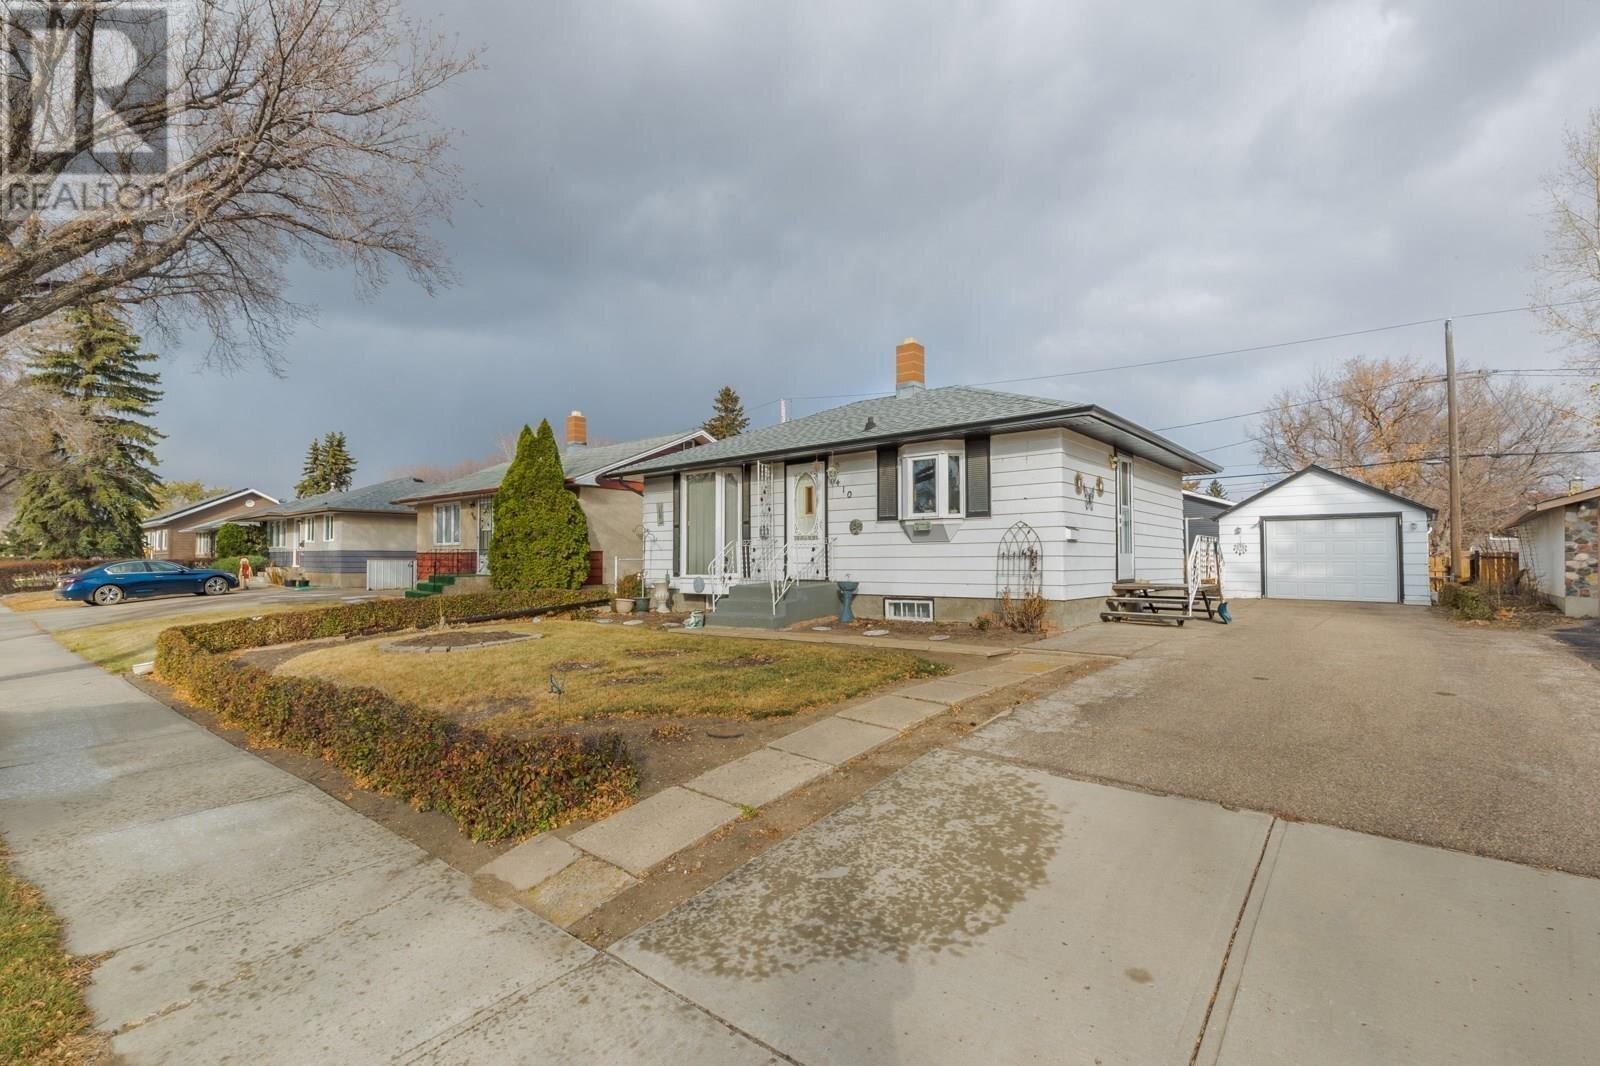 House for sale at 1410 7th Ave N Regina Saskatchewan - MLS: SK831001